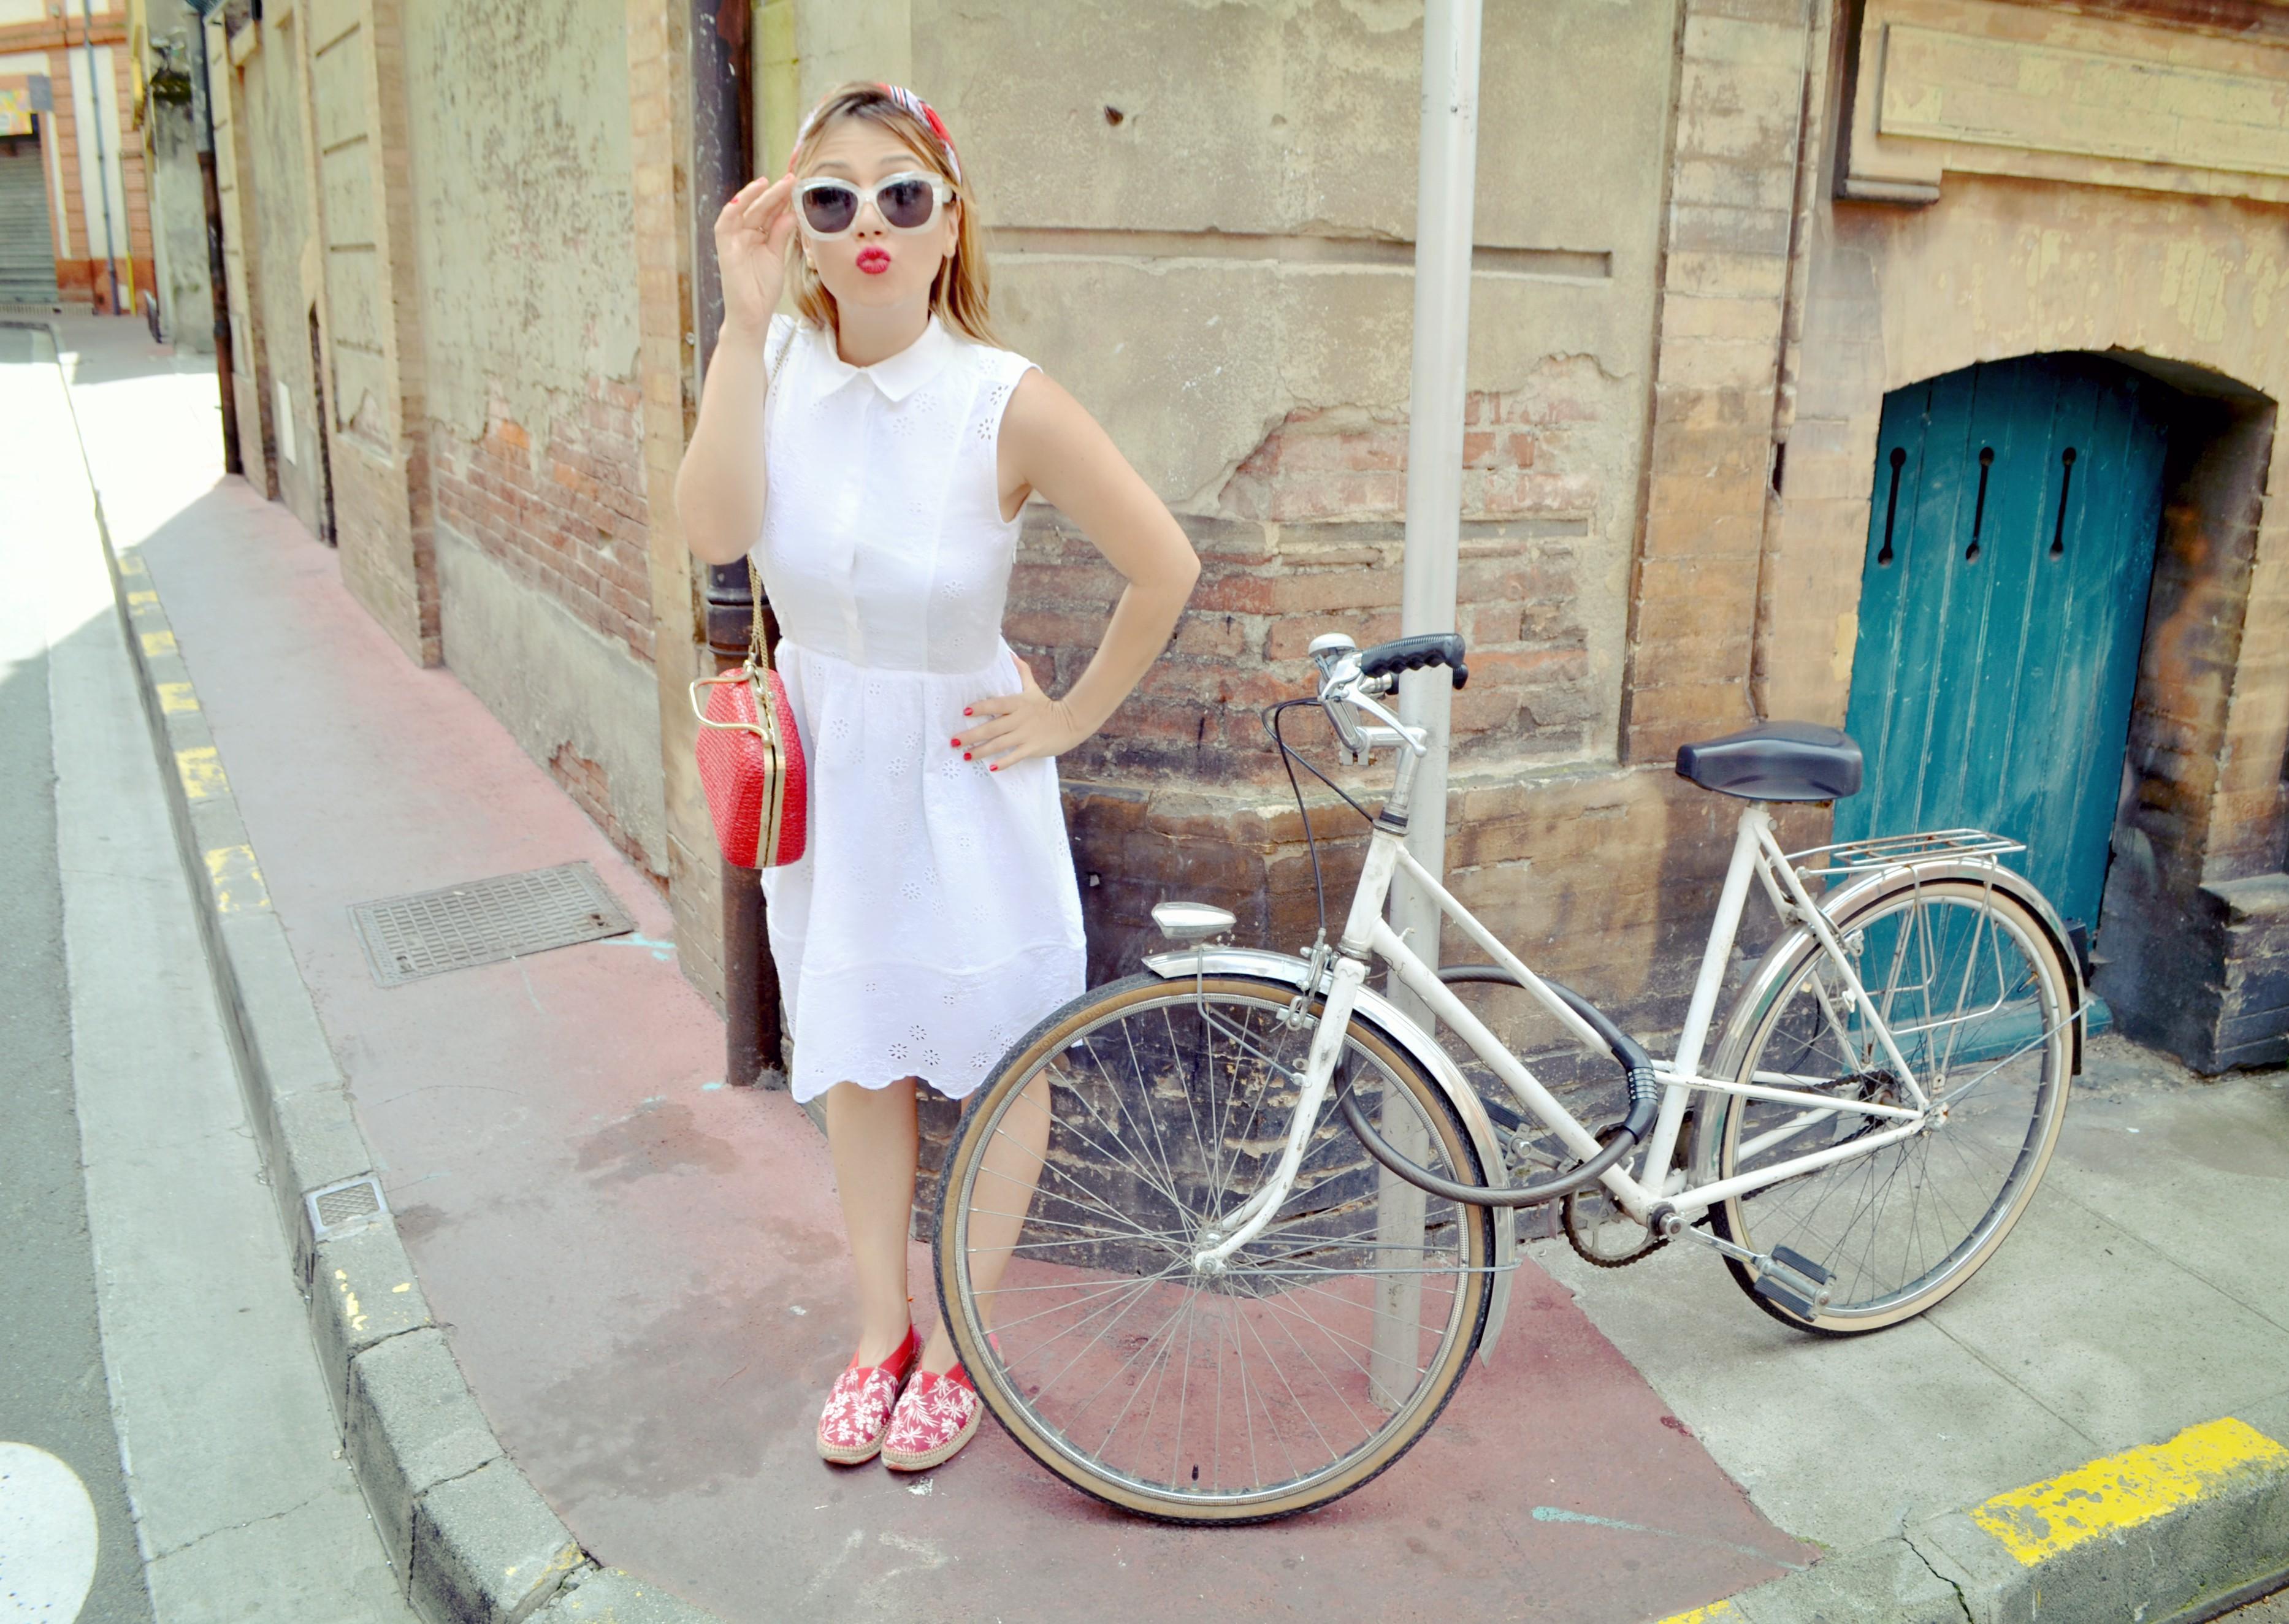 Blog-de-moda-ChicAdicta-alpargatas-instint-Chic-Adicta-fashiontravel-Toulouse-vestido-blanco-retro-PiensaenChic-Piensa-en-Chic